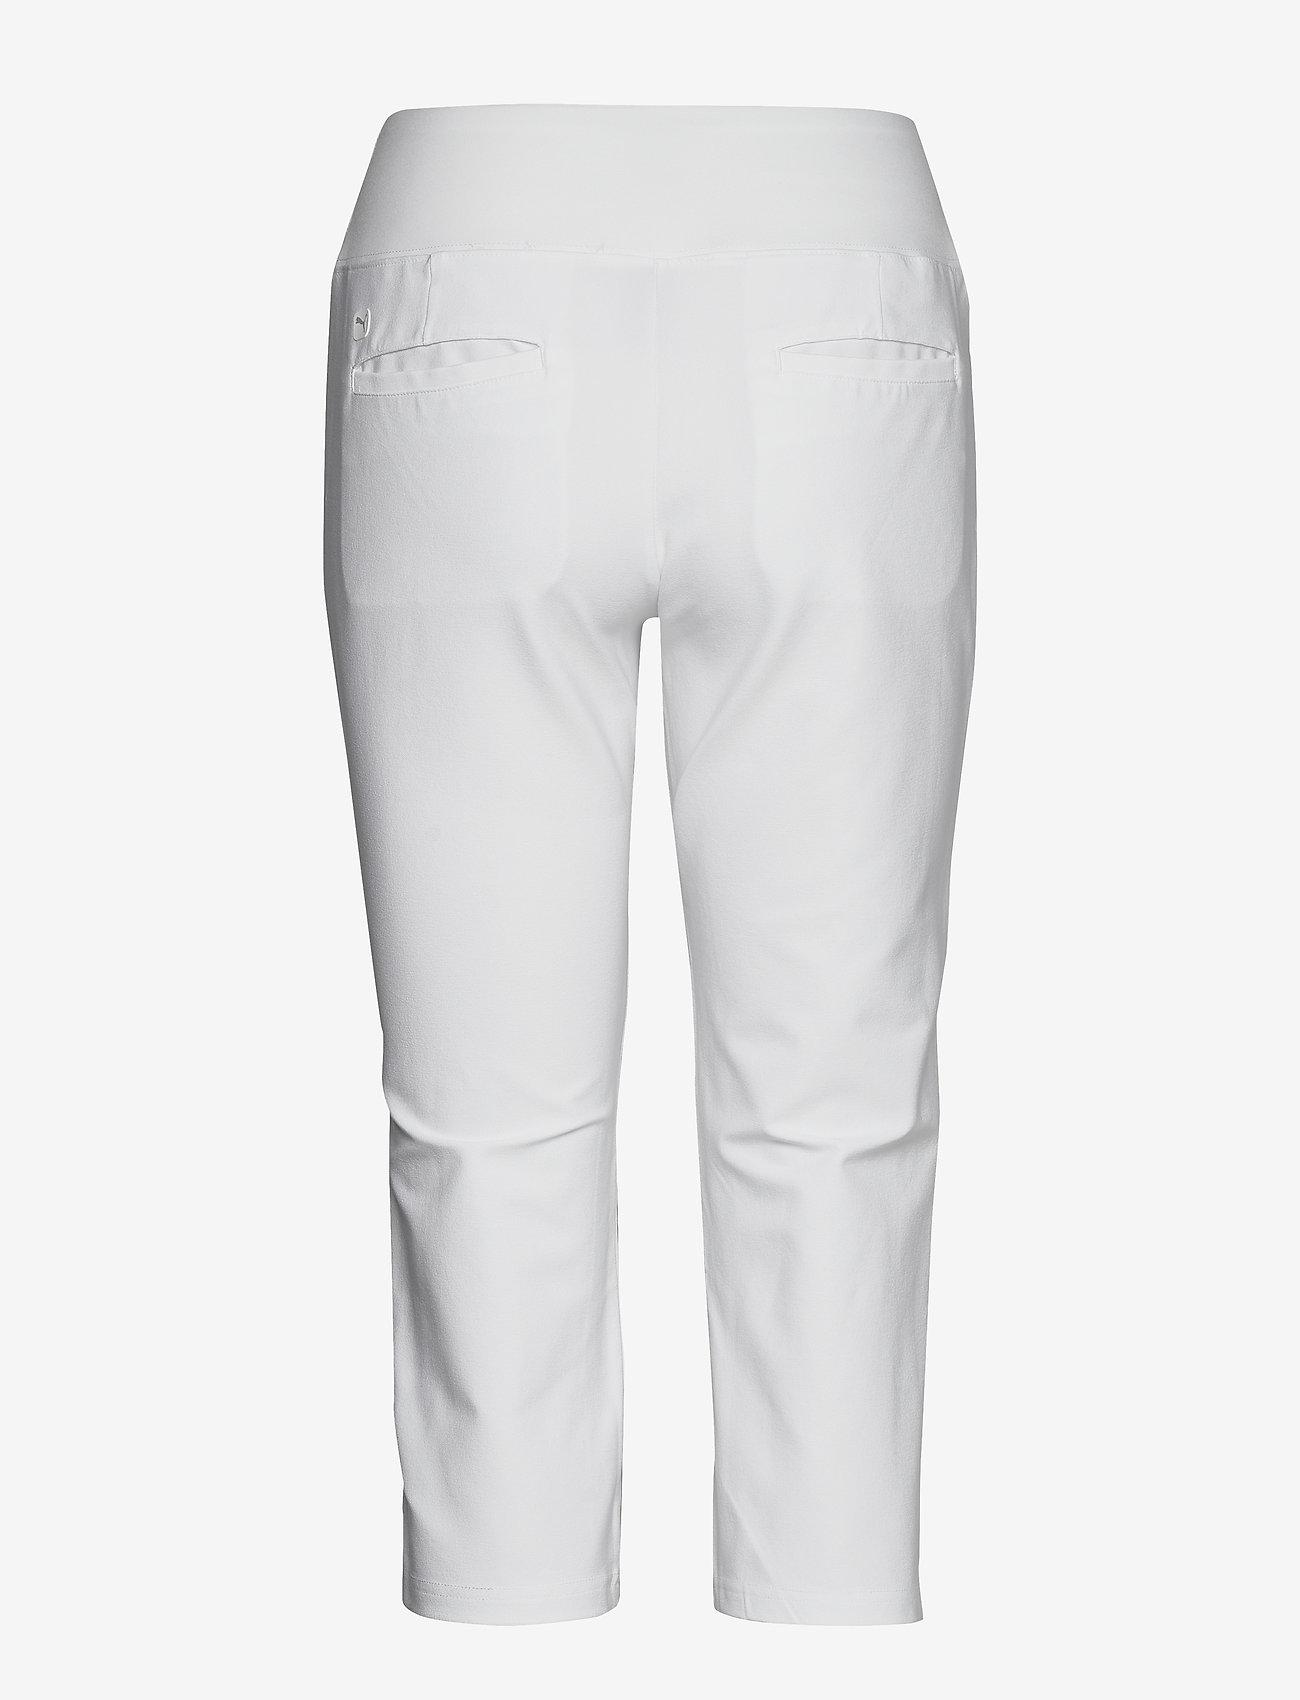 PUMA Golf - PWRSHAPE Capri - golfbroeken - bright white - 1